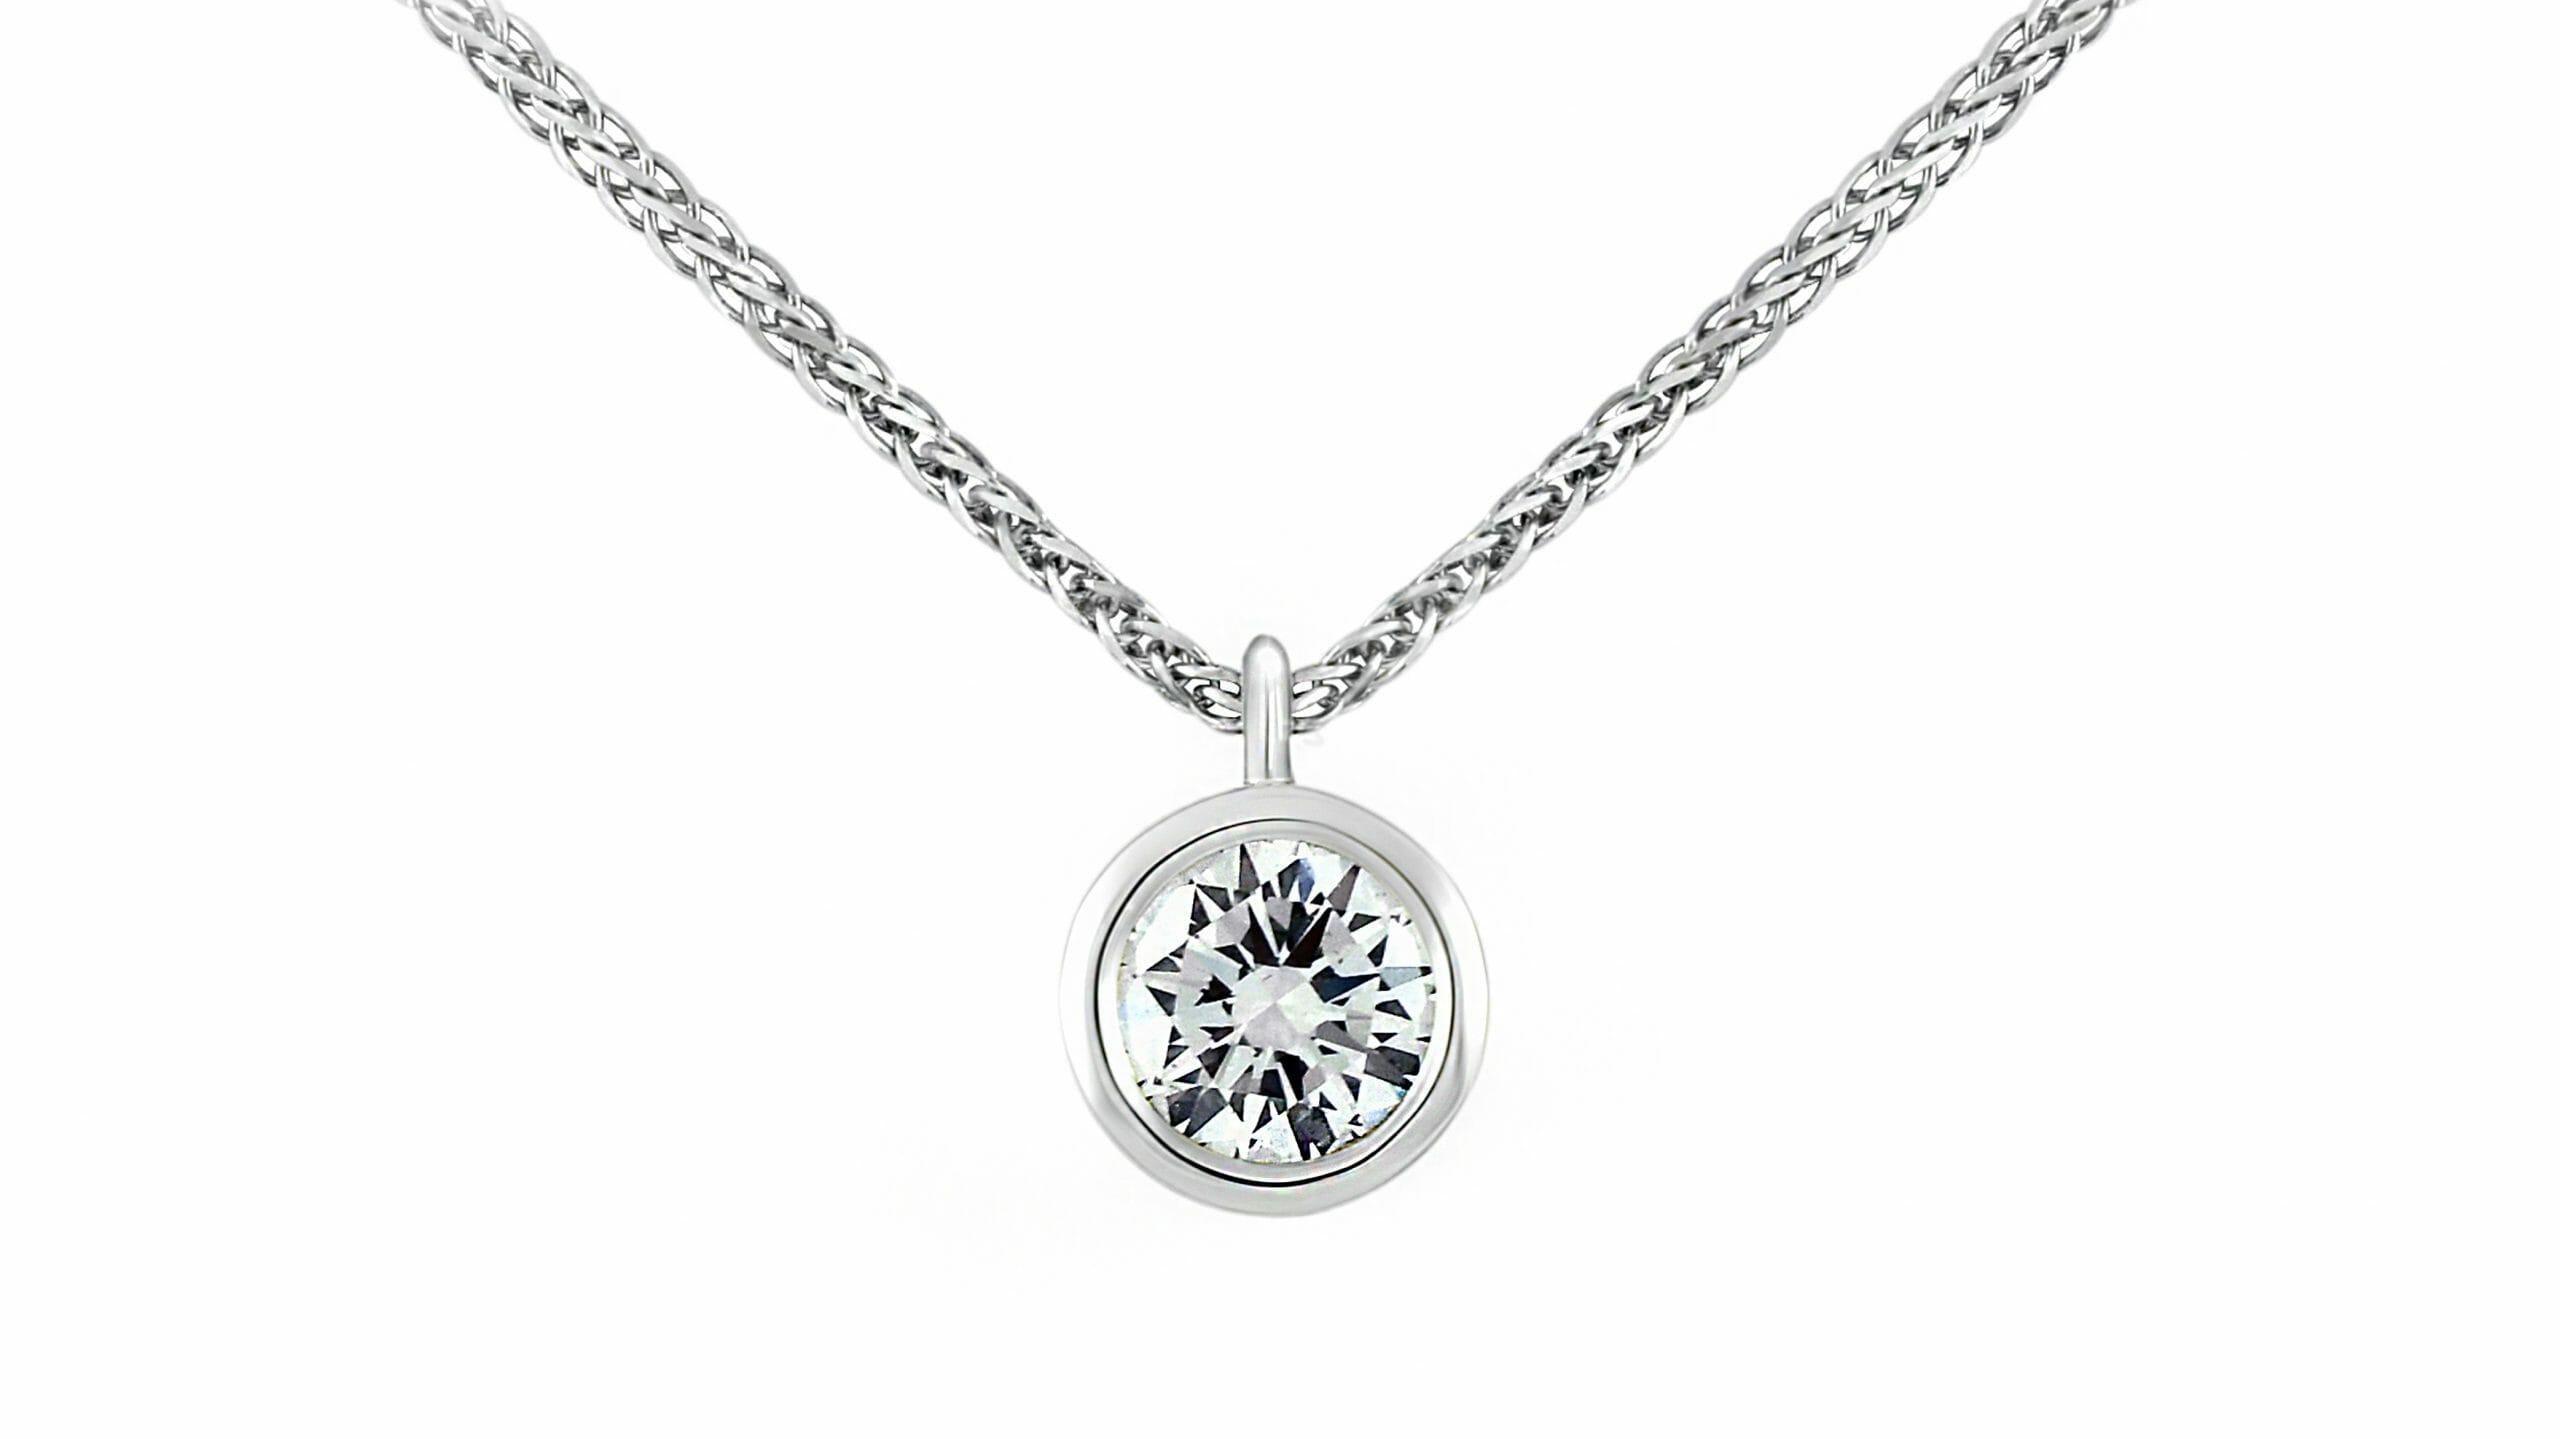 Tube-set solitaire diamond pendant